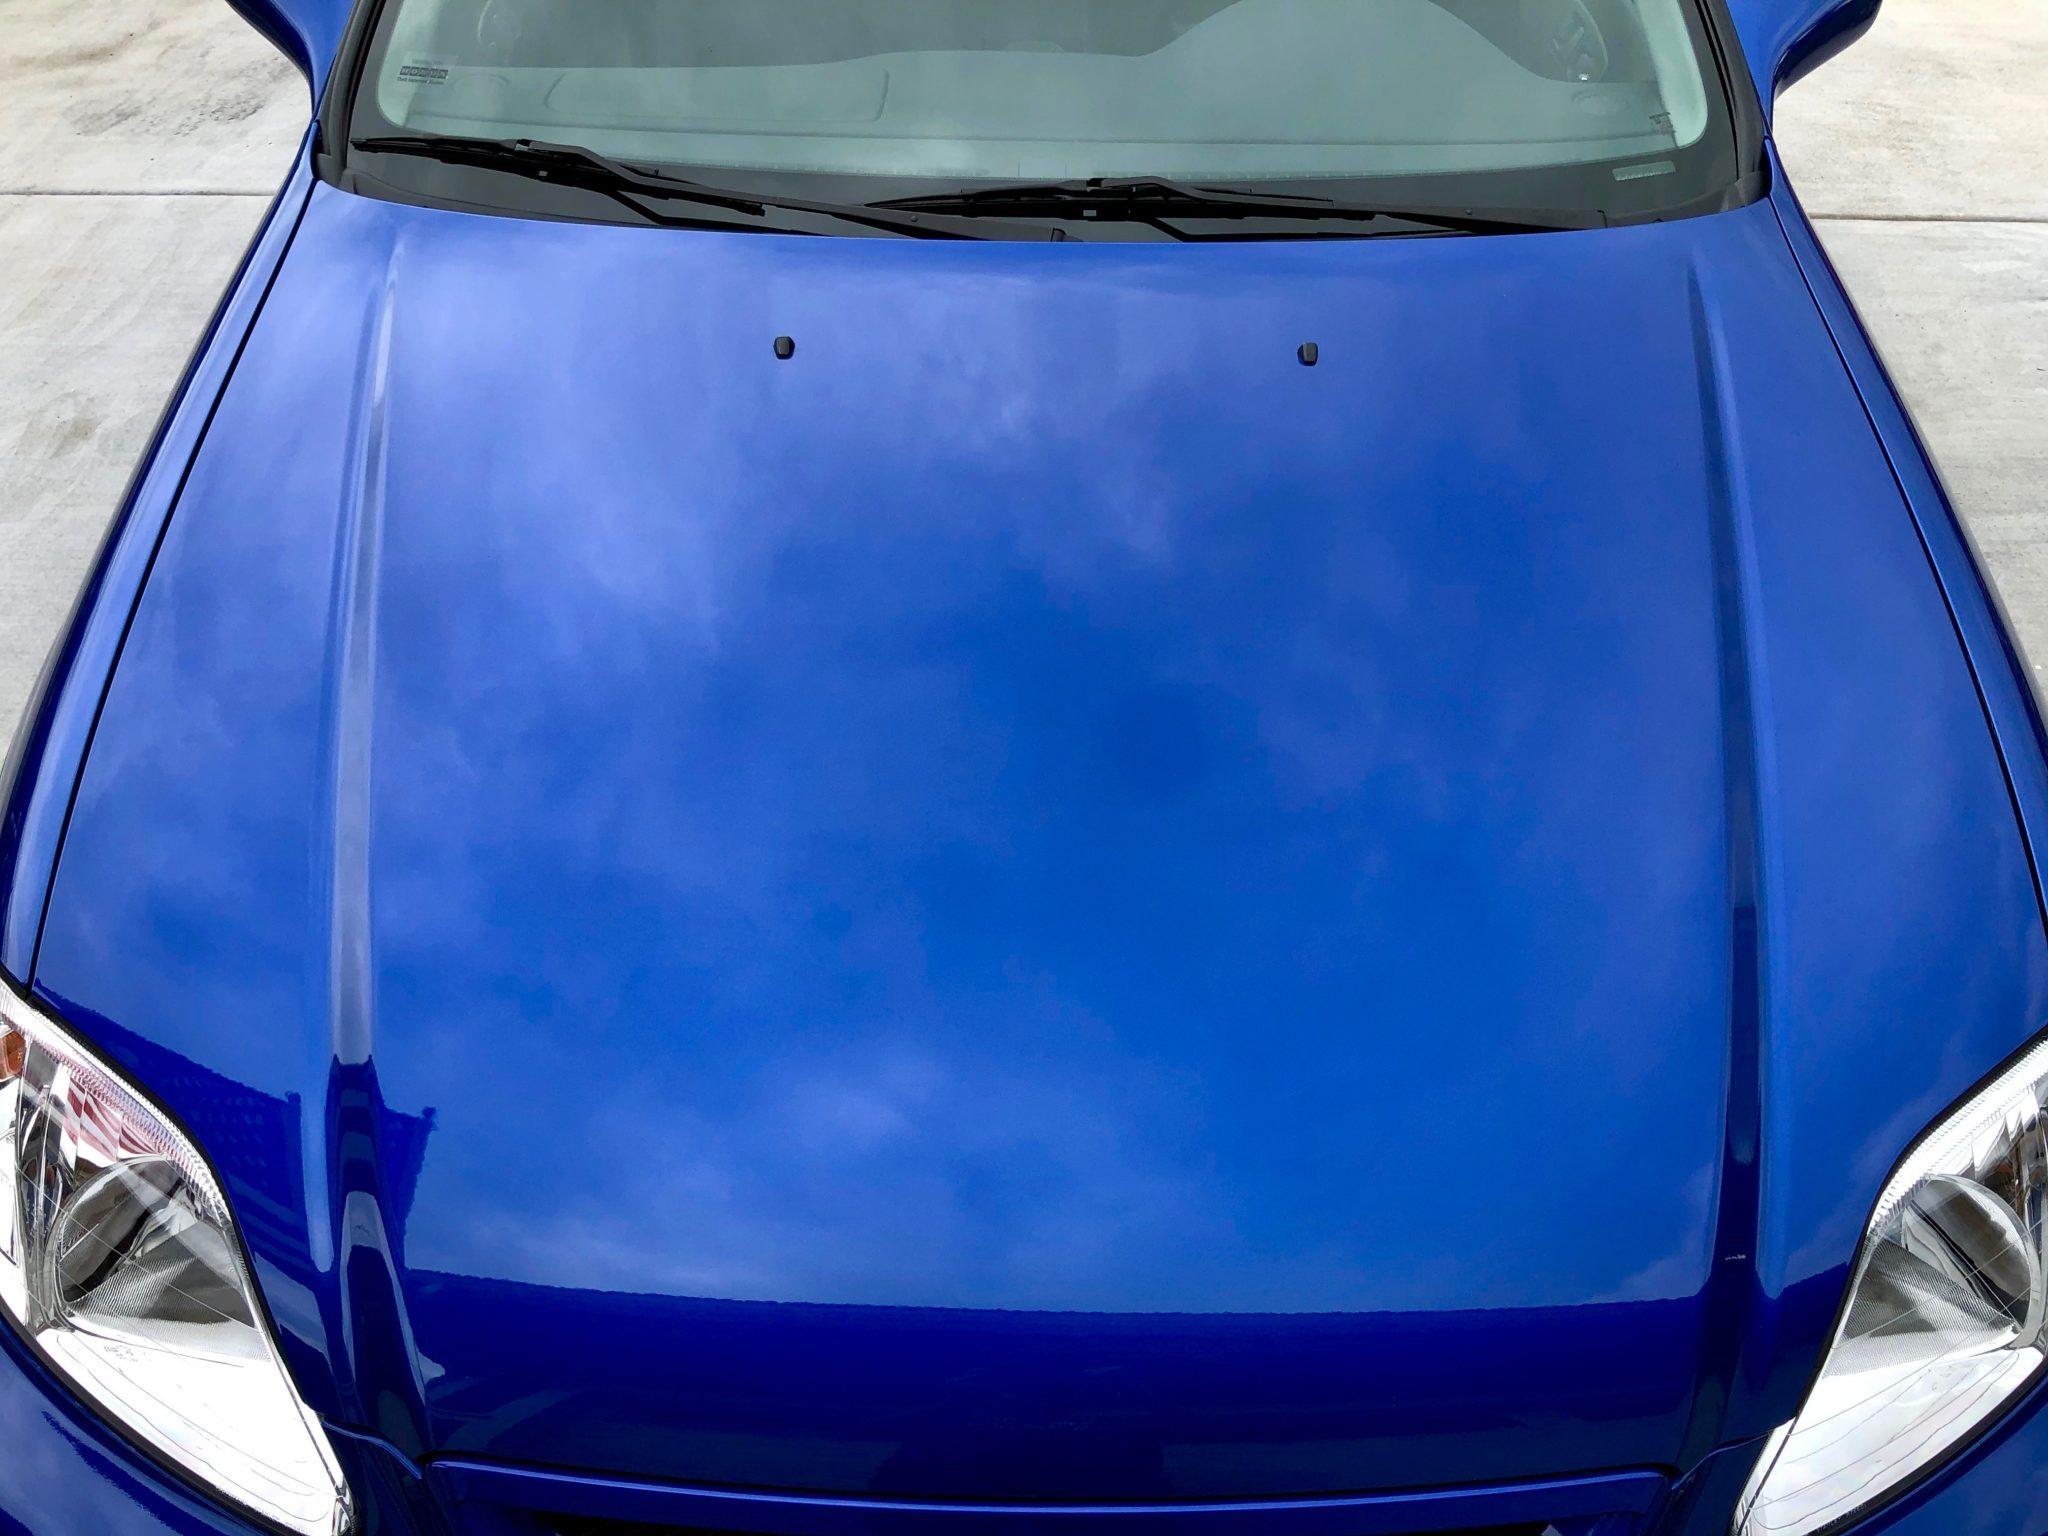 2000 Honda Civic Si Front Hood Overhead